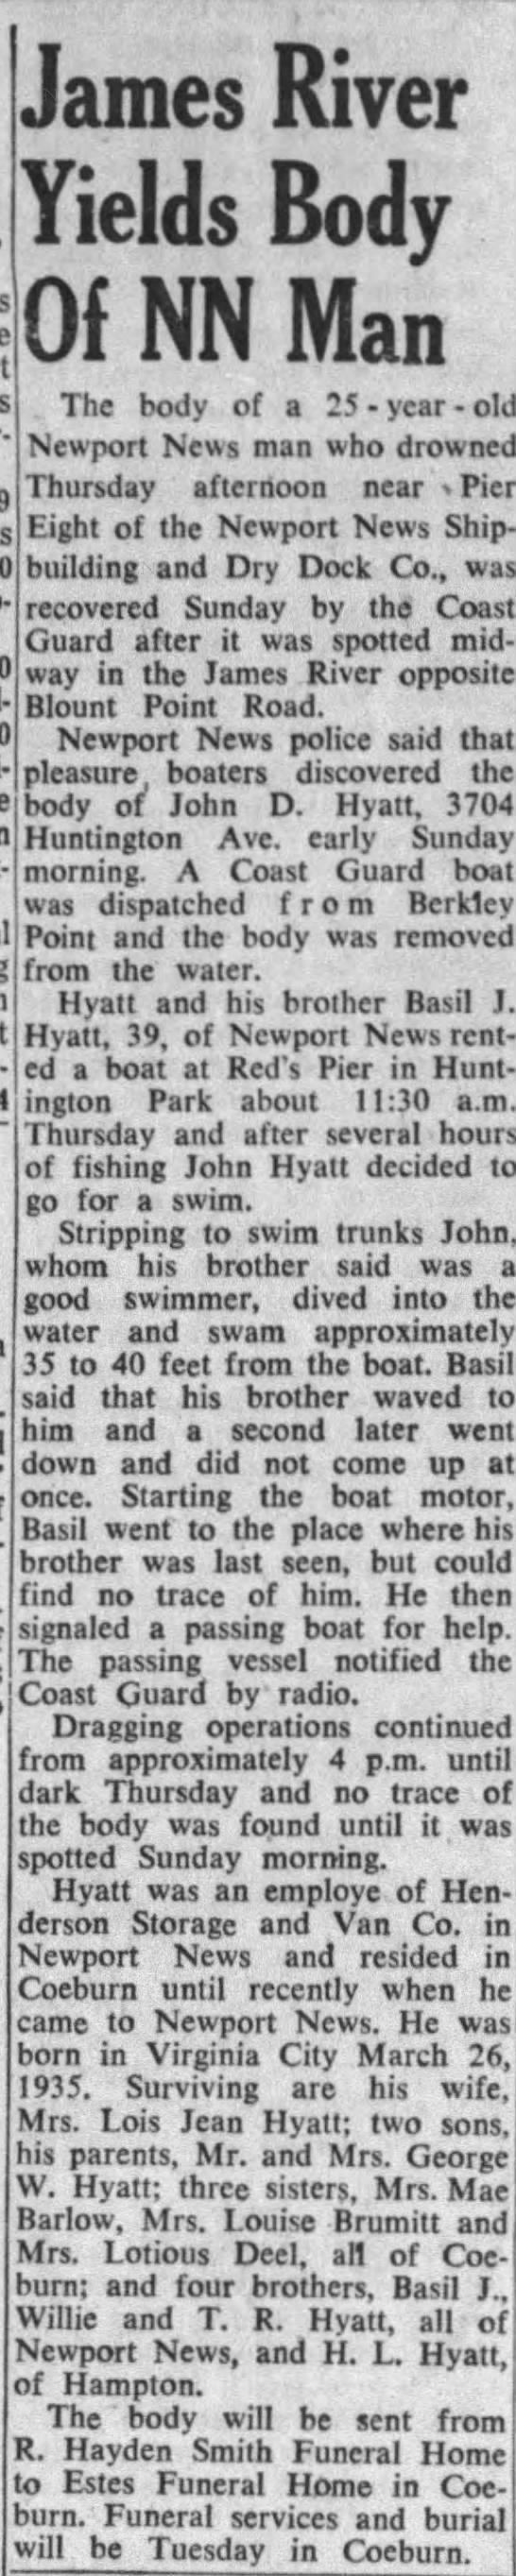 Daily Press, Newport News, Virginia, Monday, July 11, 1960 -